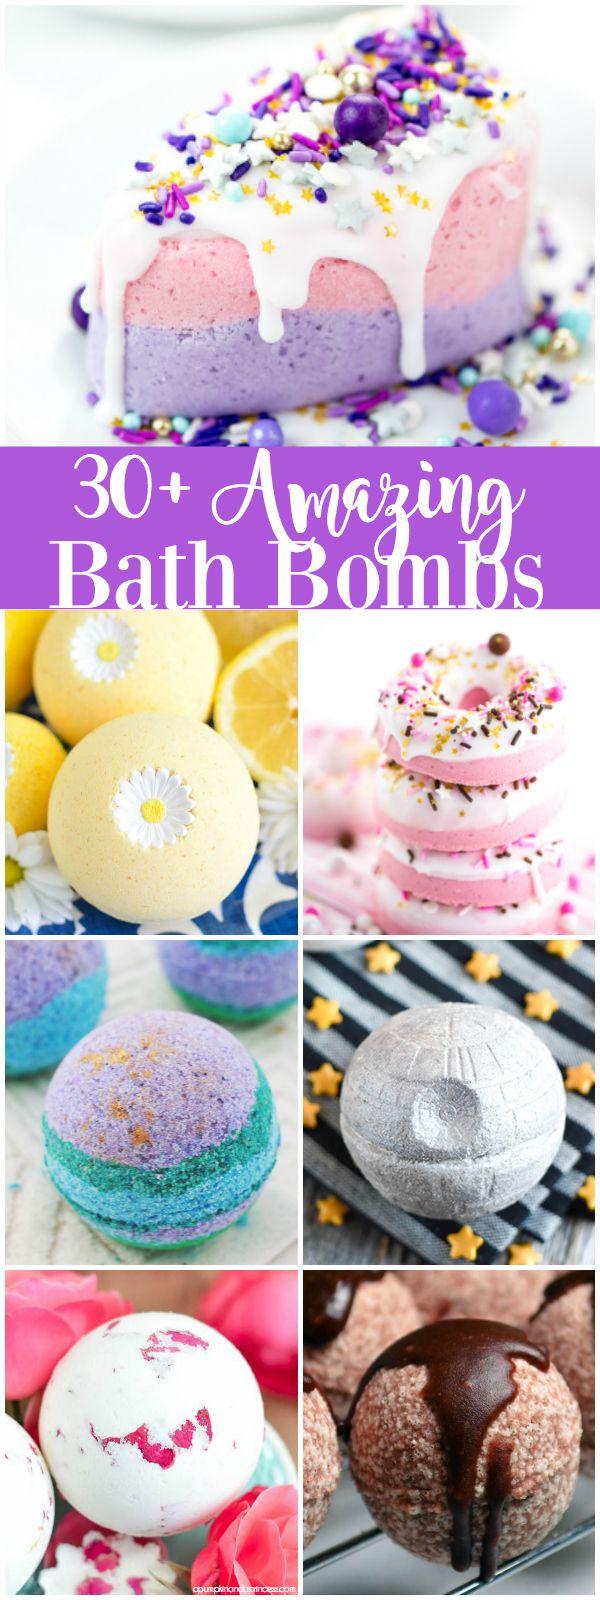 How to make amazing diy bath bombs everyday items